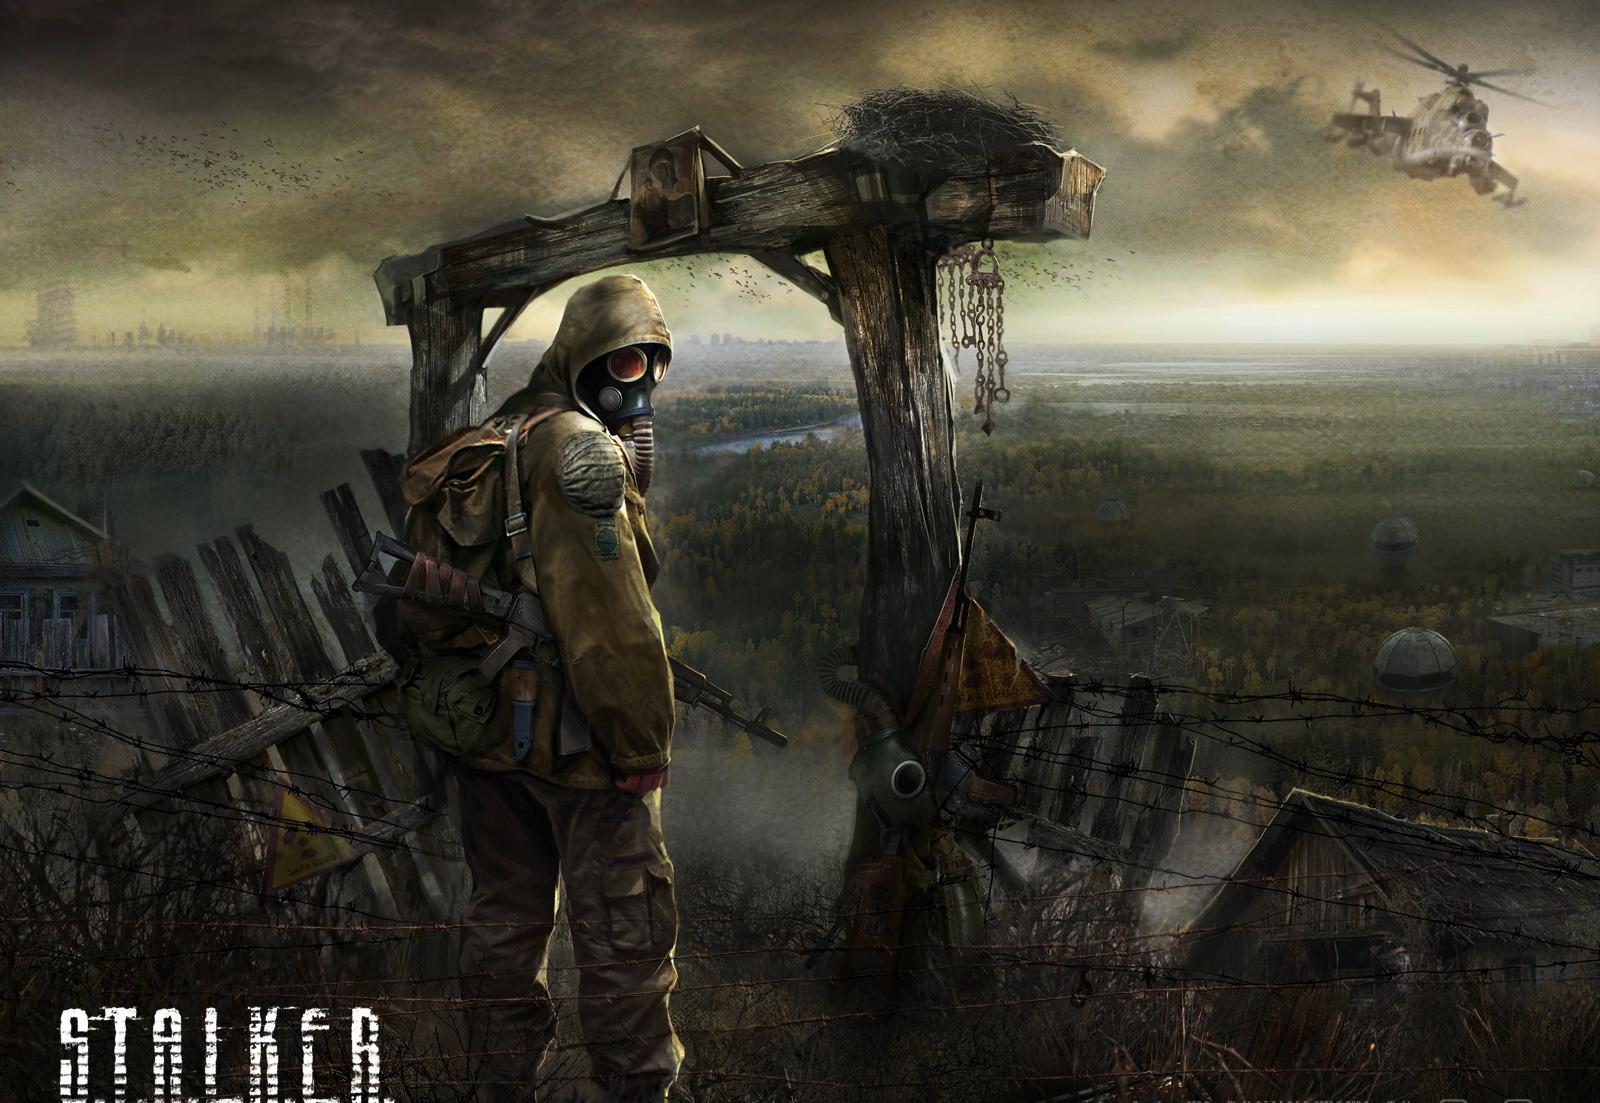 Арт к игре S.T.A.L.K.E.R.: Call of Pripyat